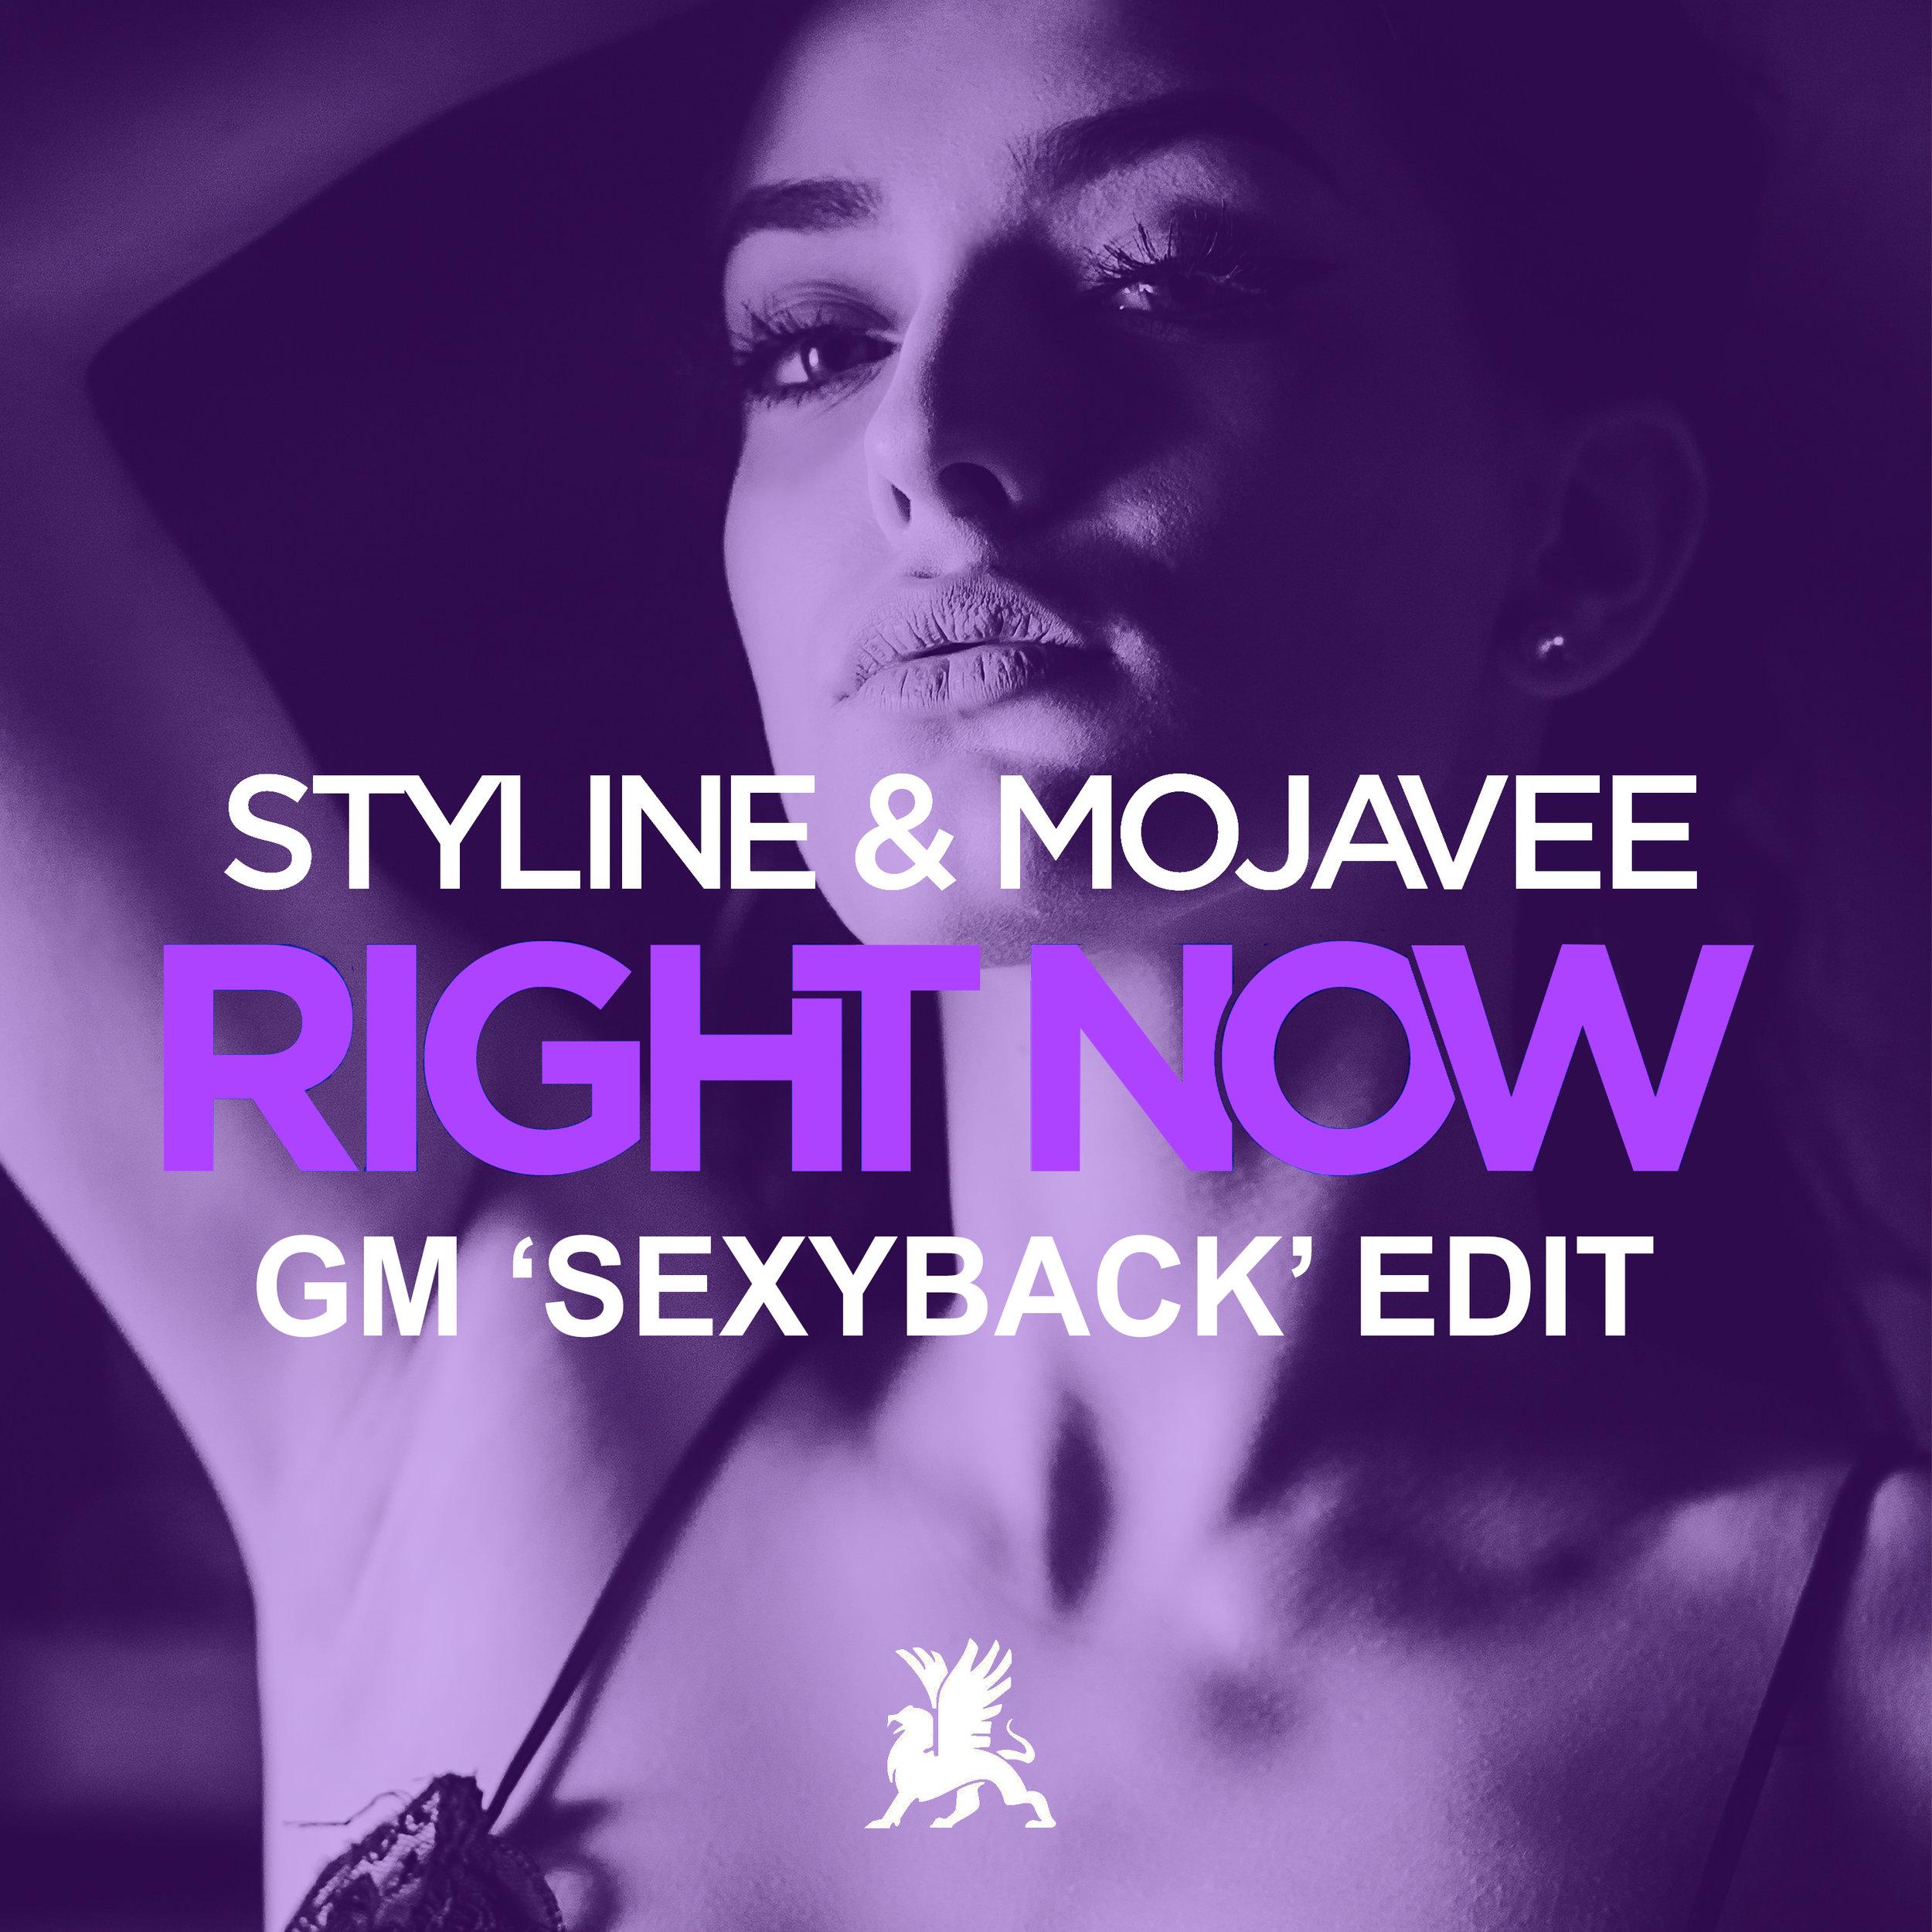 Right Now GM SexyBack Edit Artwork.jpg